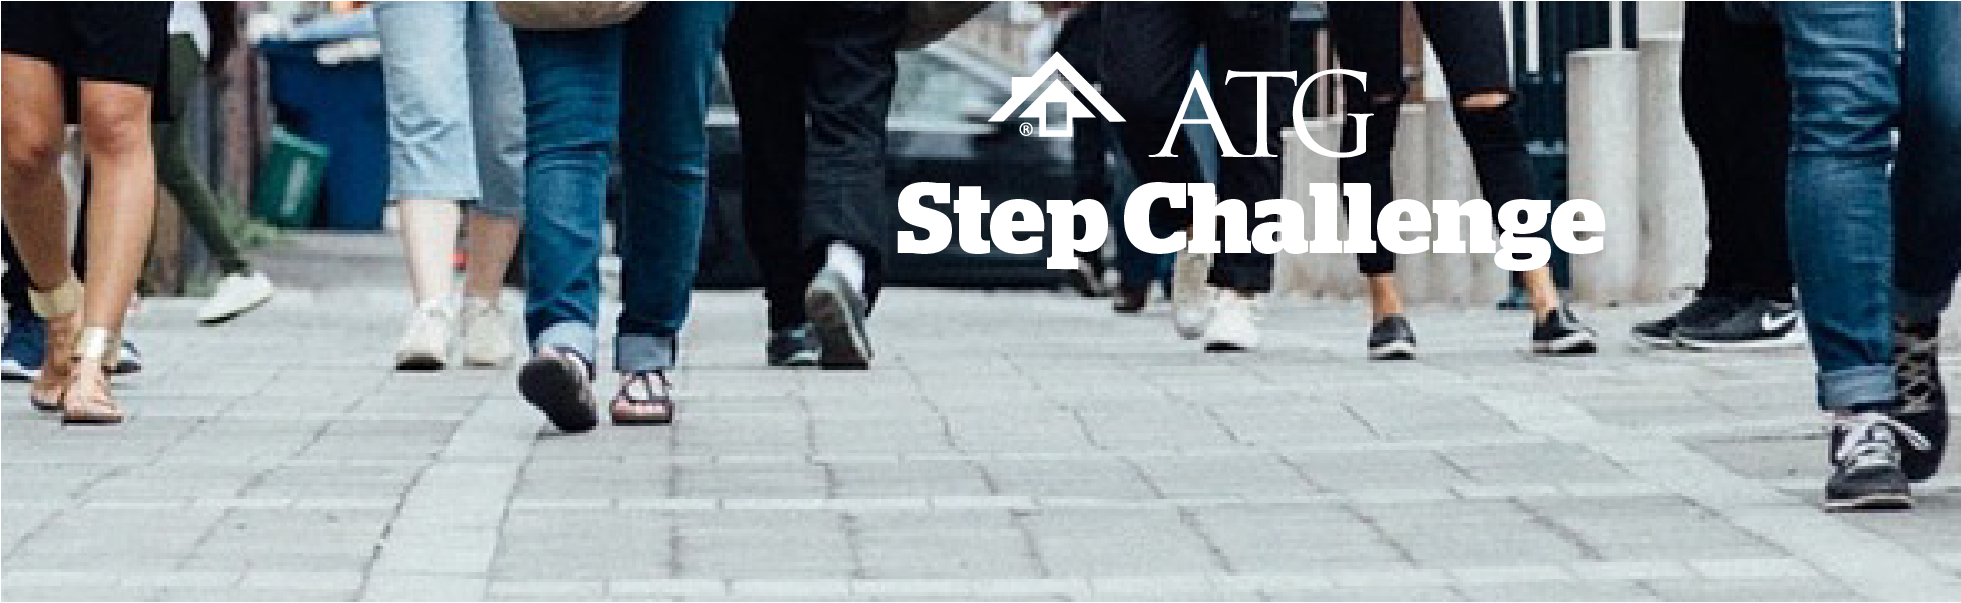 2019 ATG Step Challenge Banner